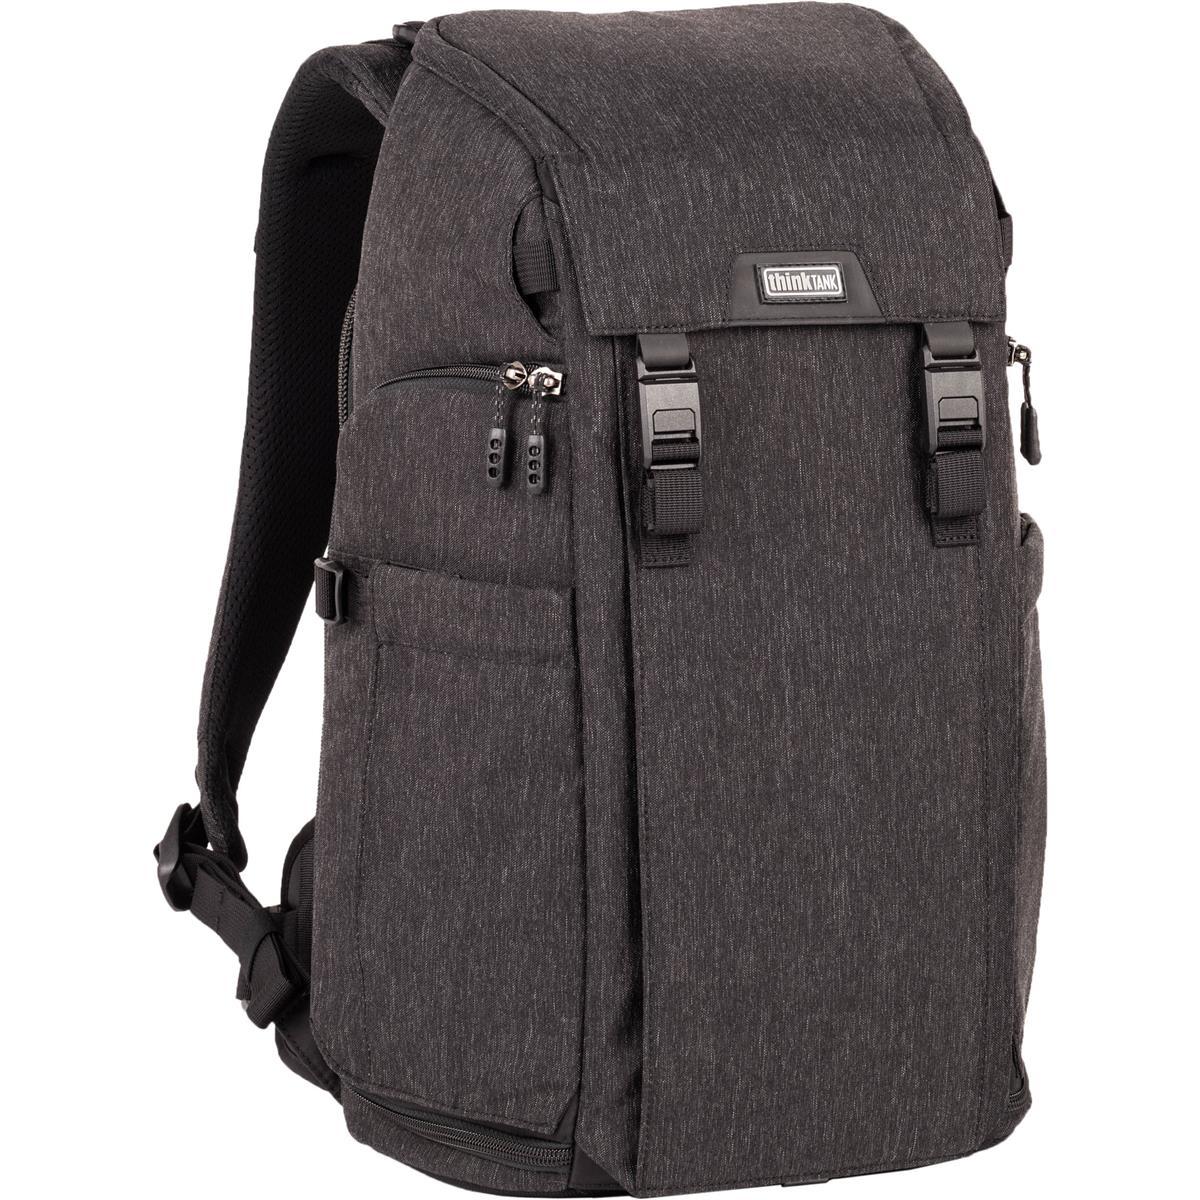 Think Tank Photo Urban Access 13 Backpack (Black)